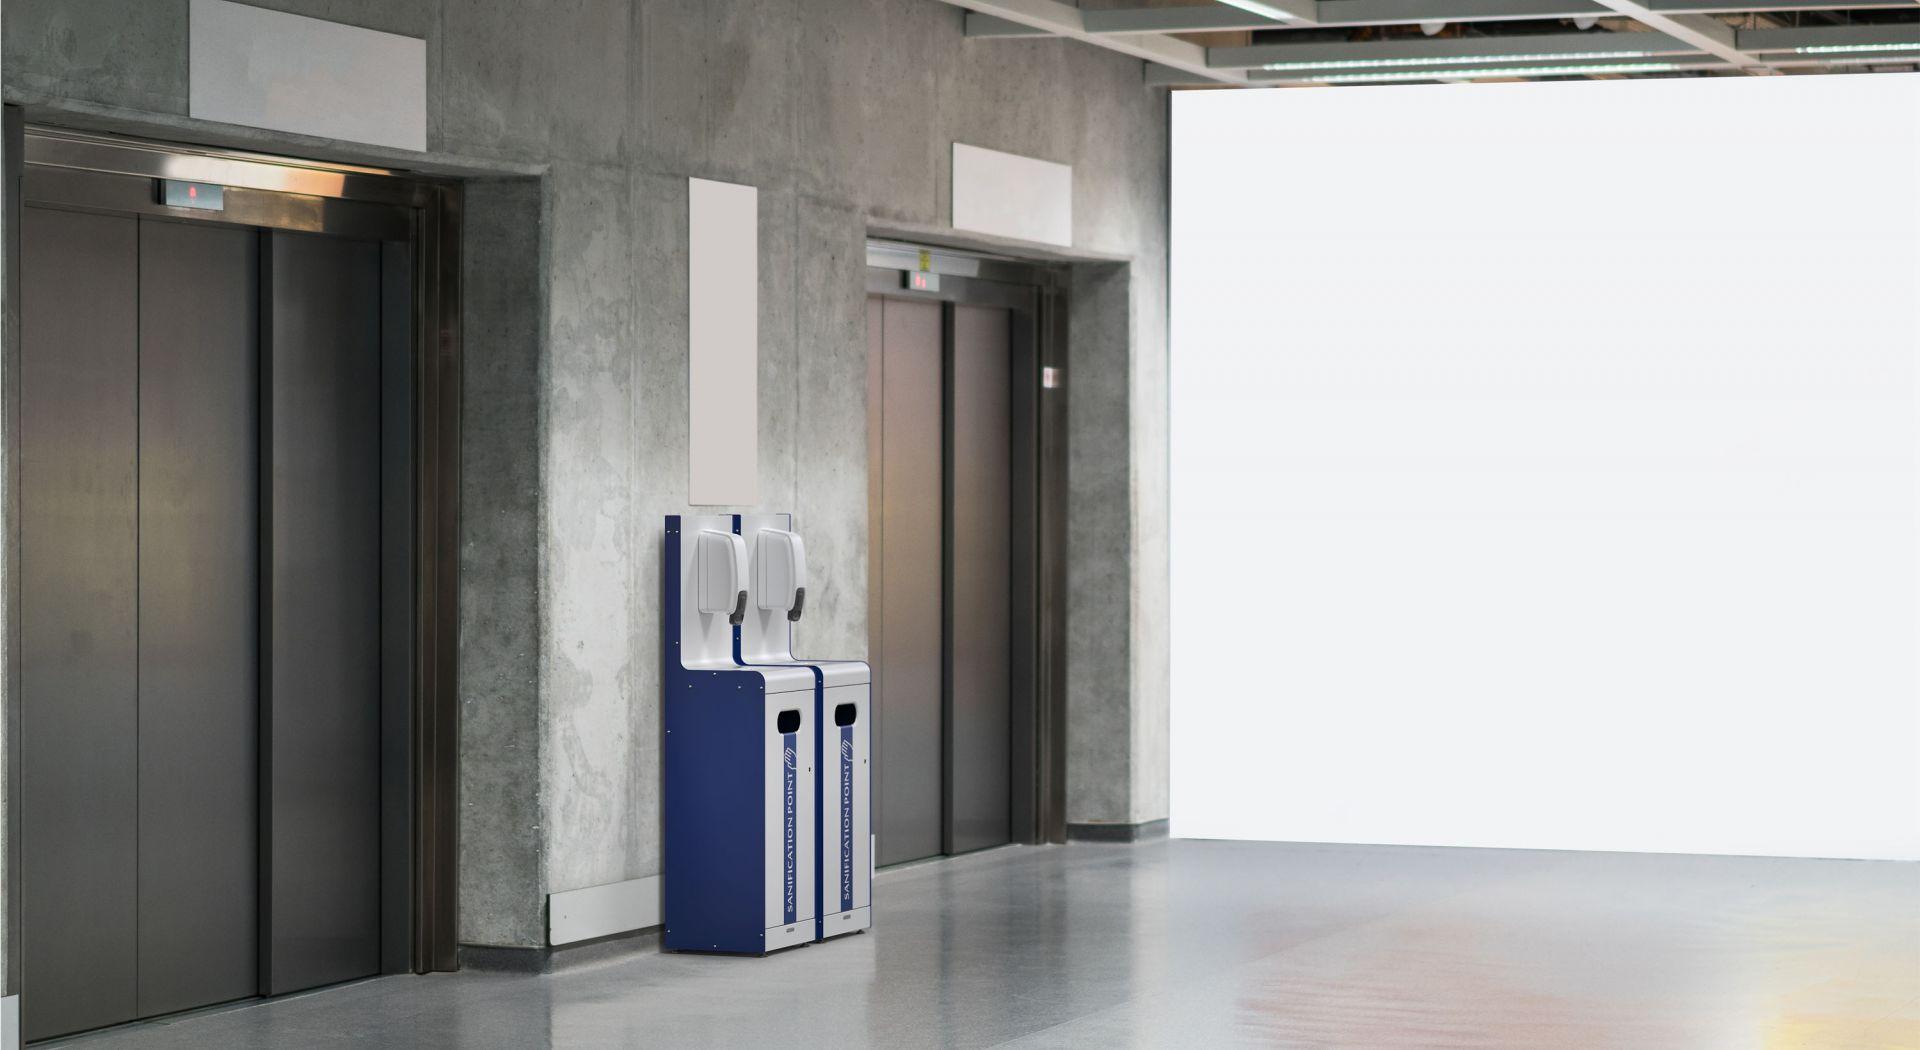 Micro station sanitaire pour lutter contre le COVID-19 coronavirus